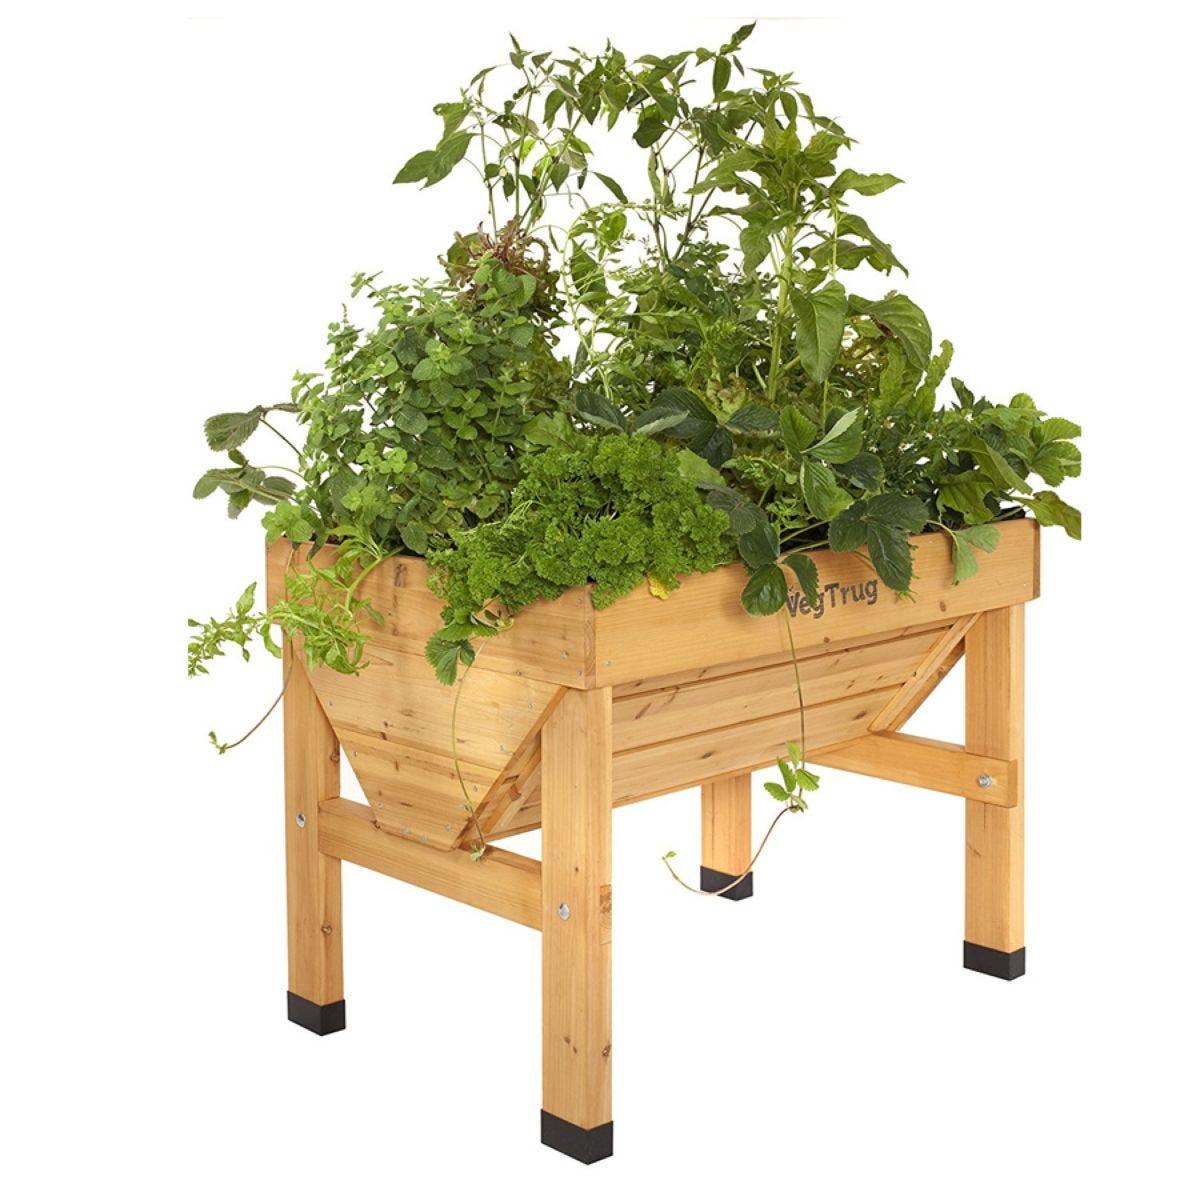 VegTrug Small Classic Raised Planter – Natural